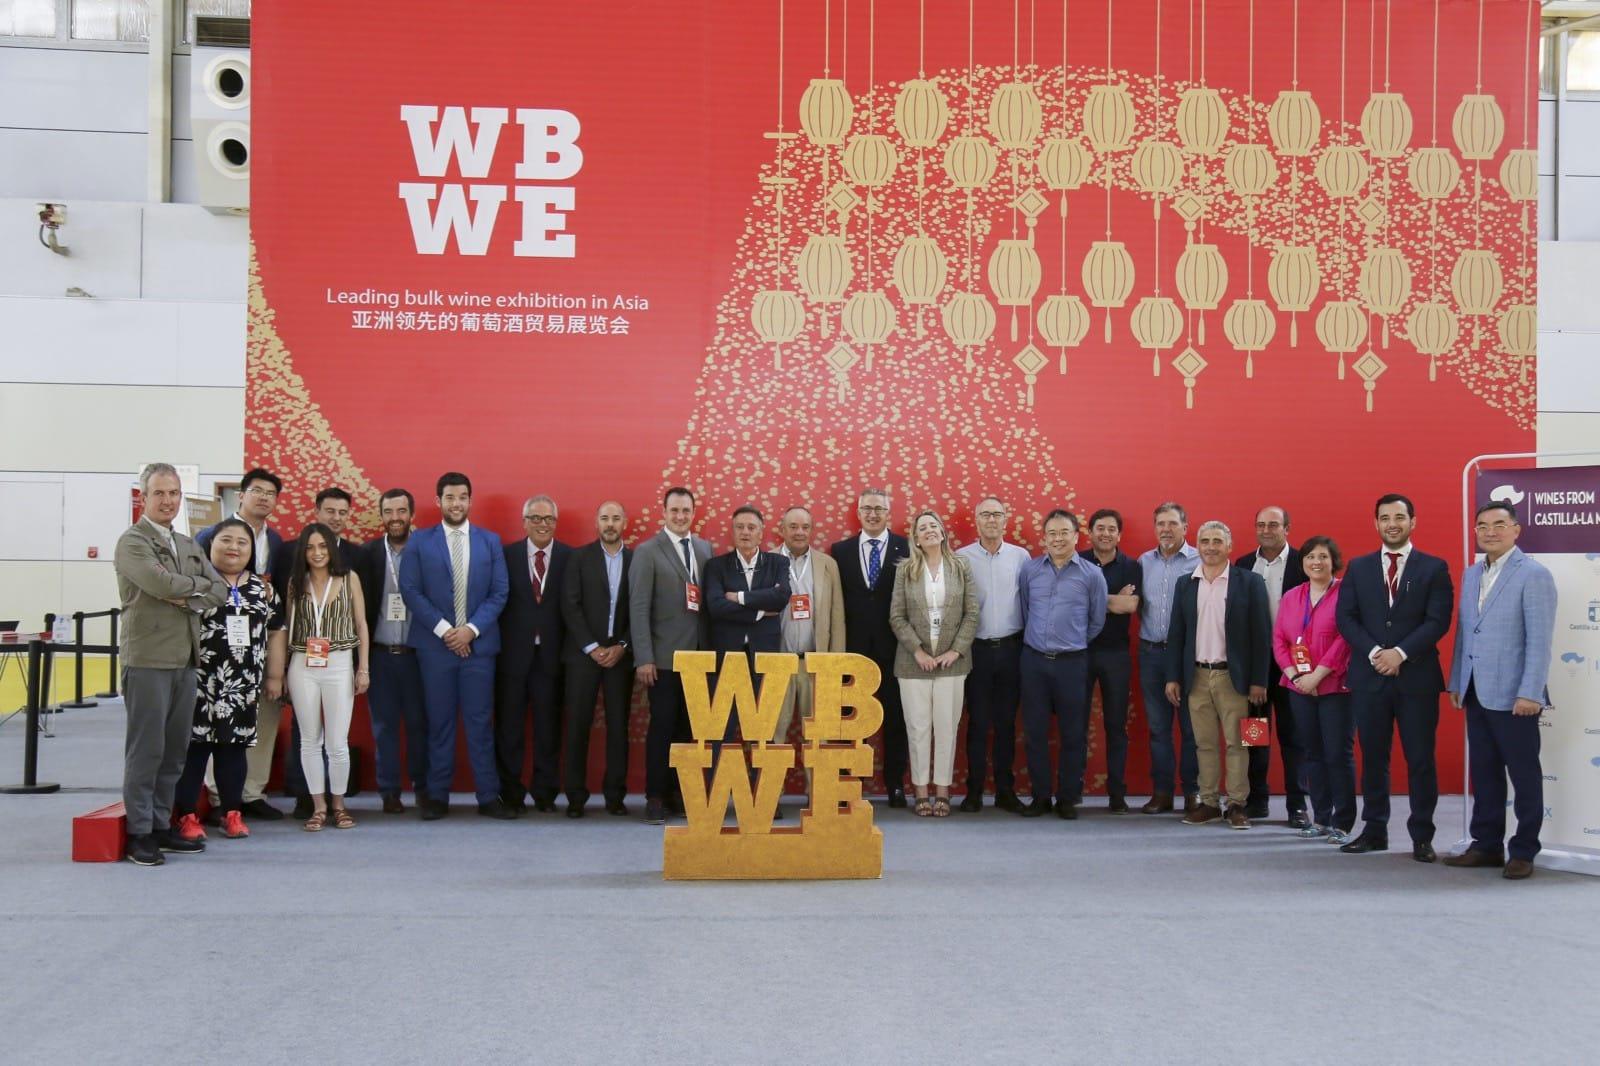 https://blog.globalcaja.es/wp-content/uploads/2019/06/WBWE-Asia.jpeg